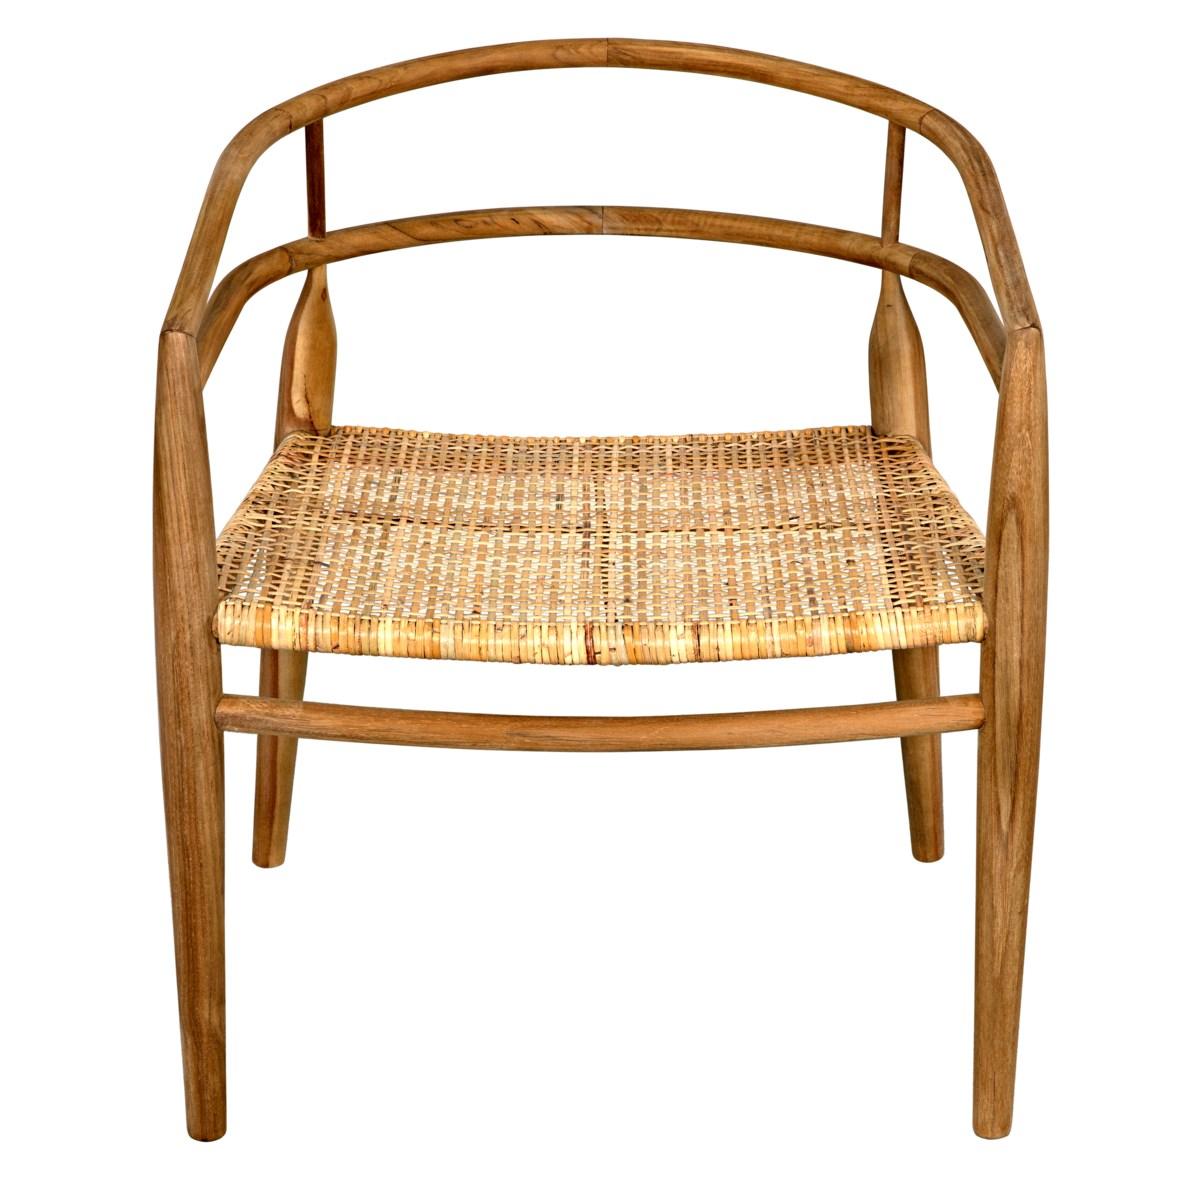 Finley Chair with Rattan, Teak